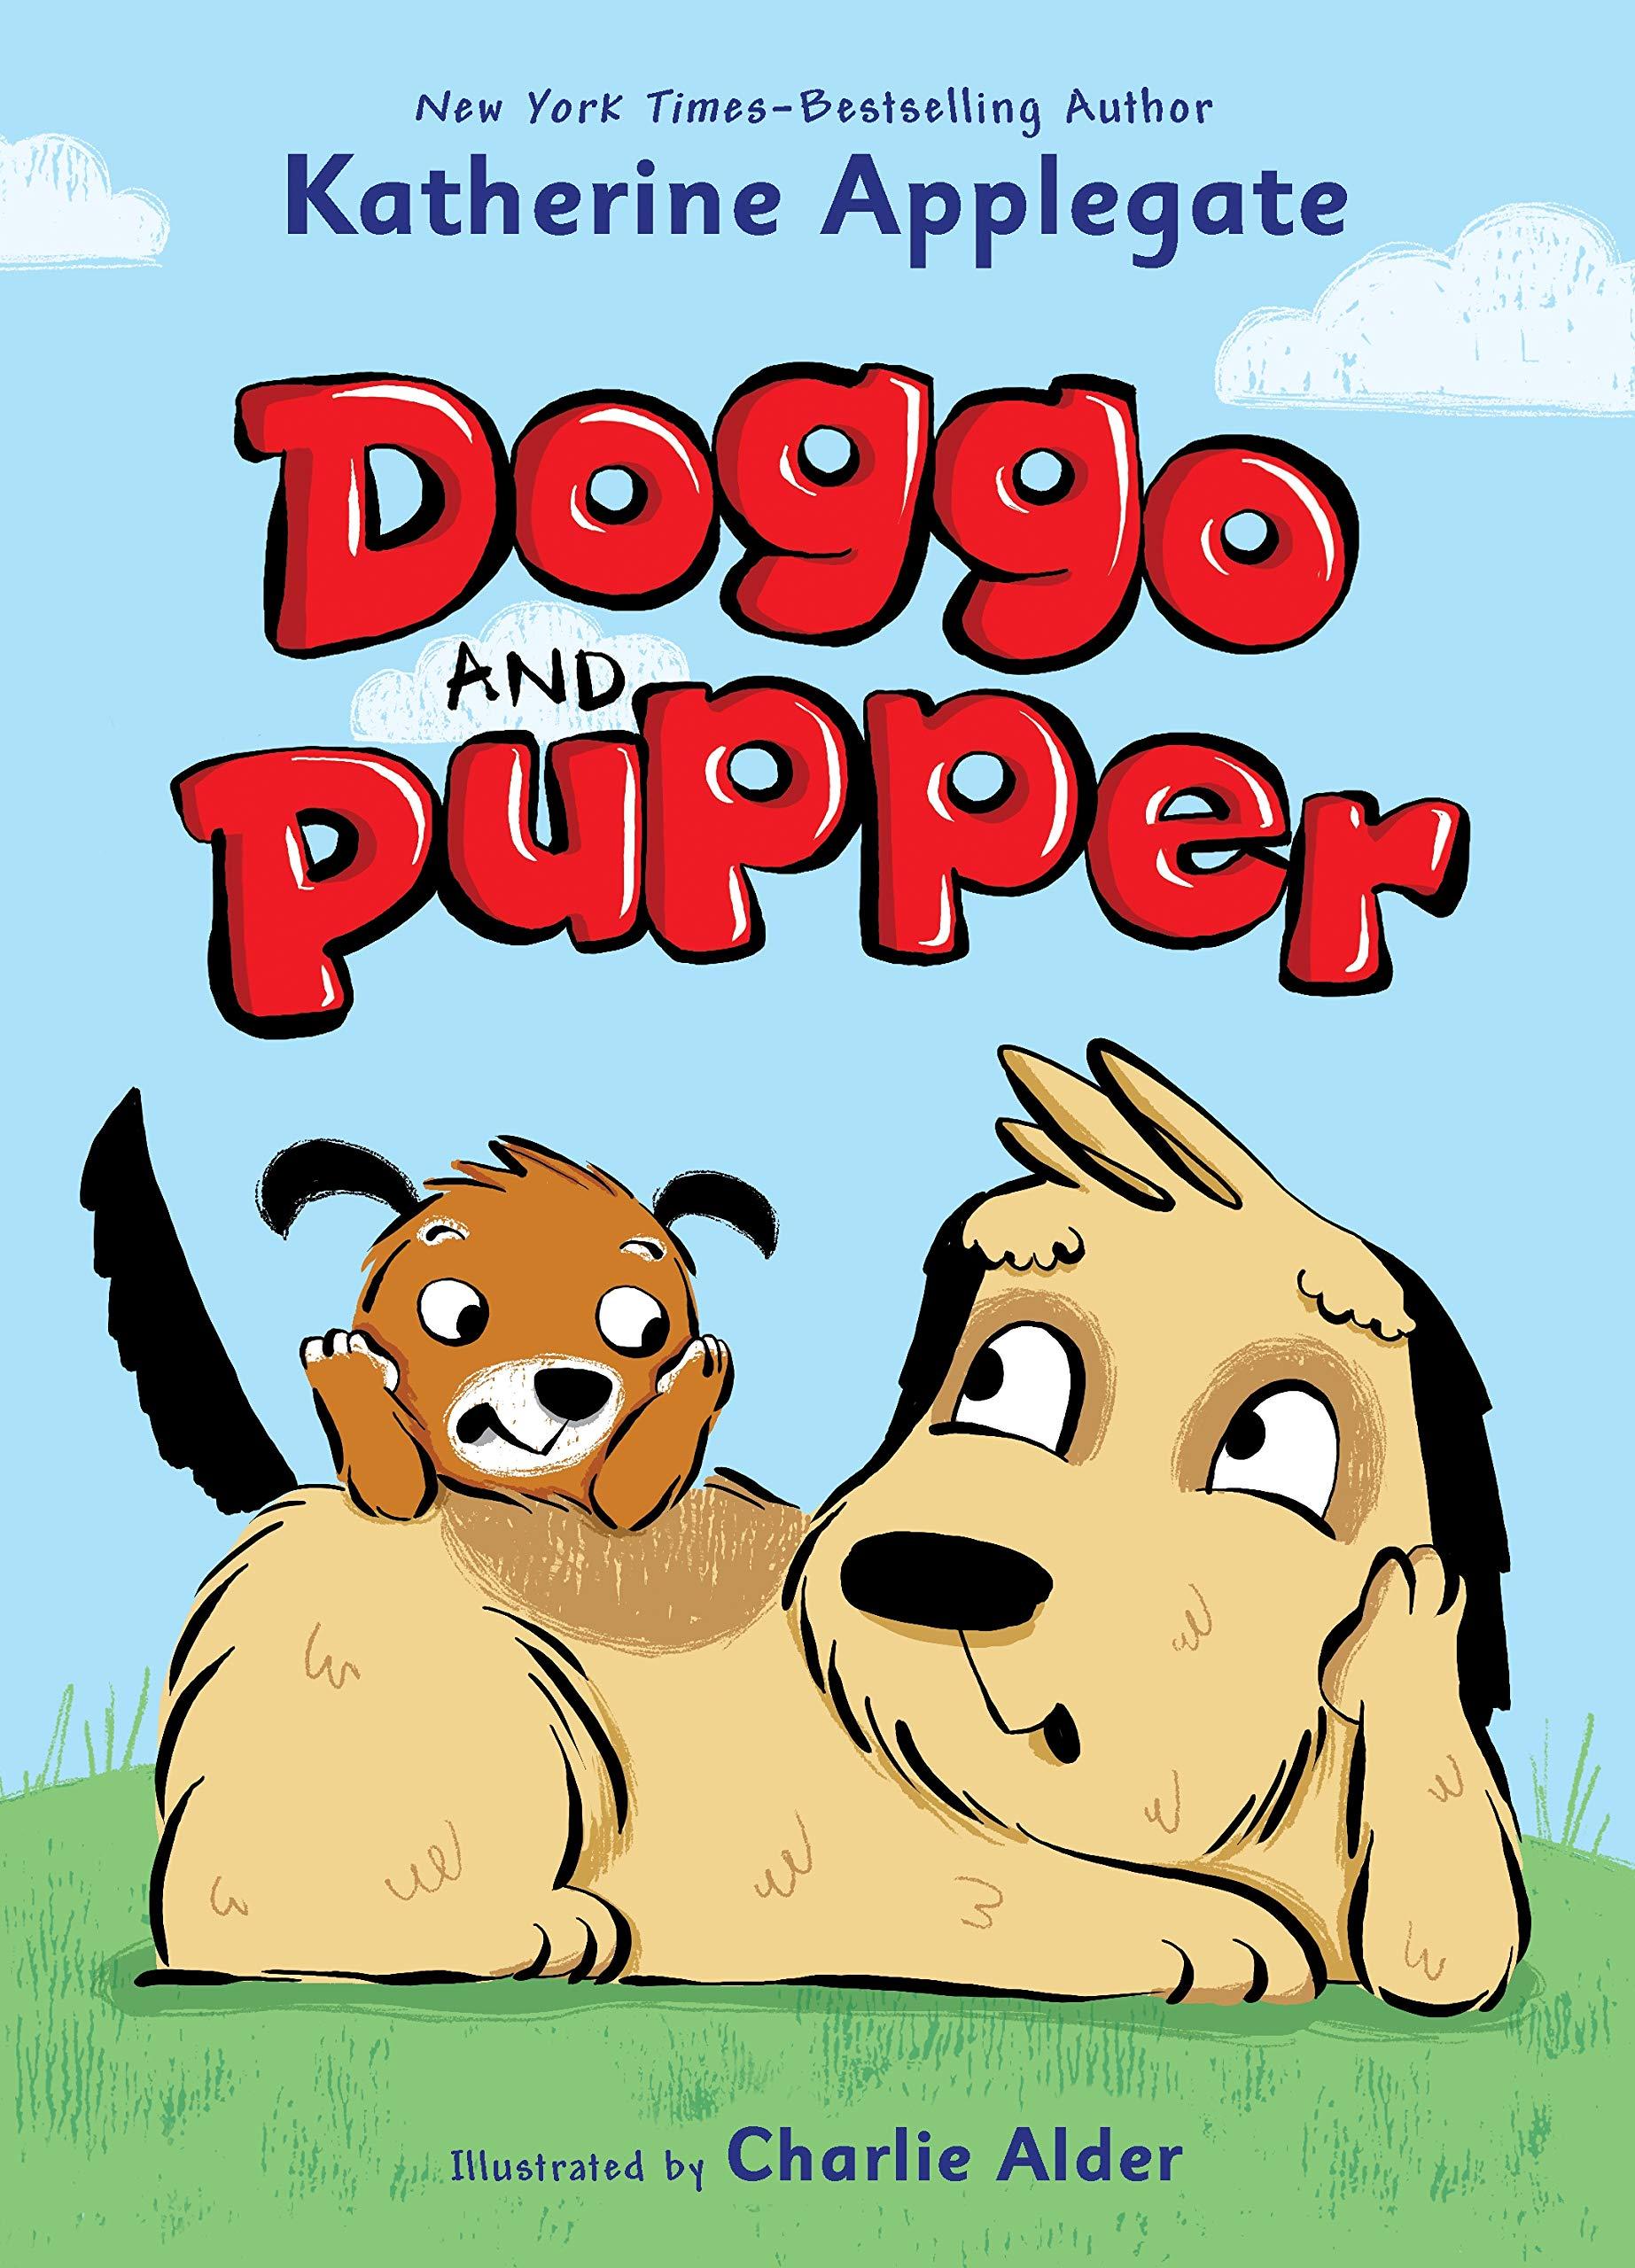 Amazon.com: Doggo and Pupper (Doggo and Pupper, 1) (9781250620972):  Applegate, Katherine, Alder, Charlie: Books